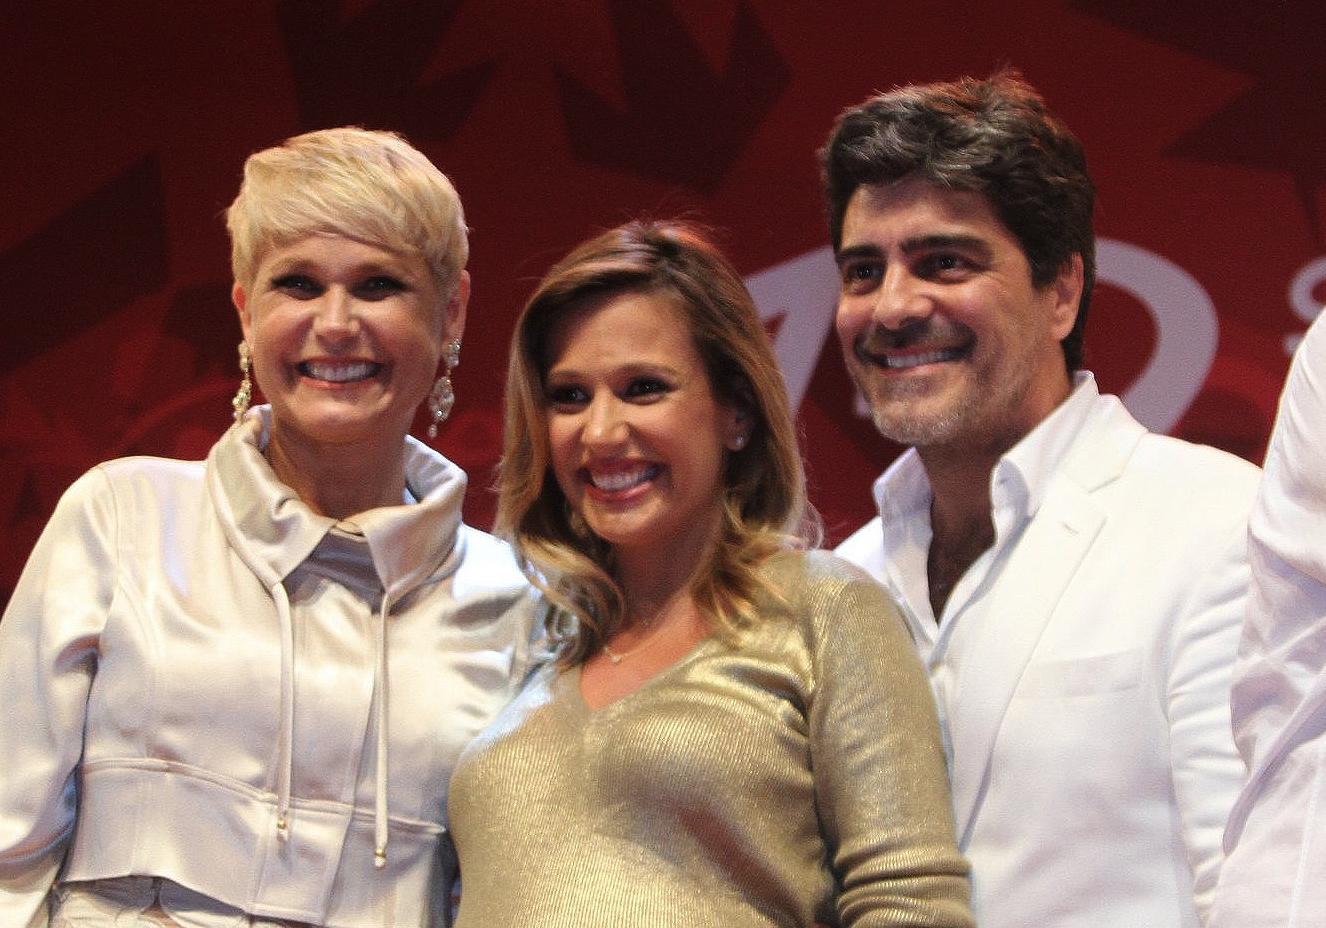 Thiago Duran e ou Francisco Cepeda/AgNews